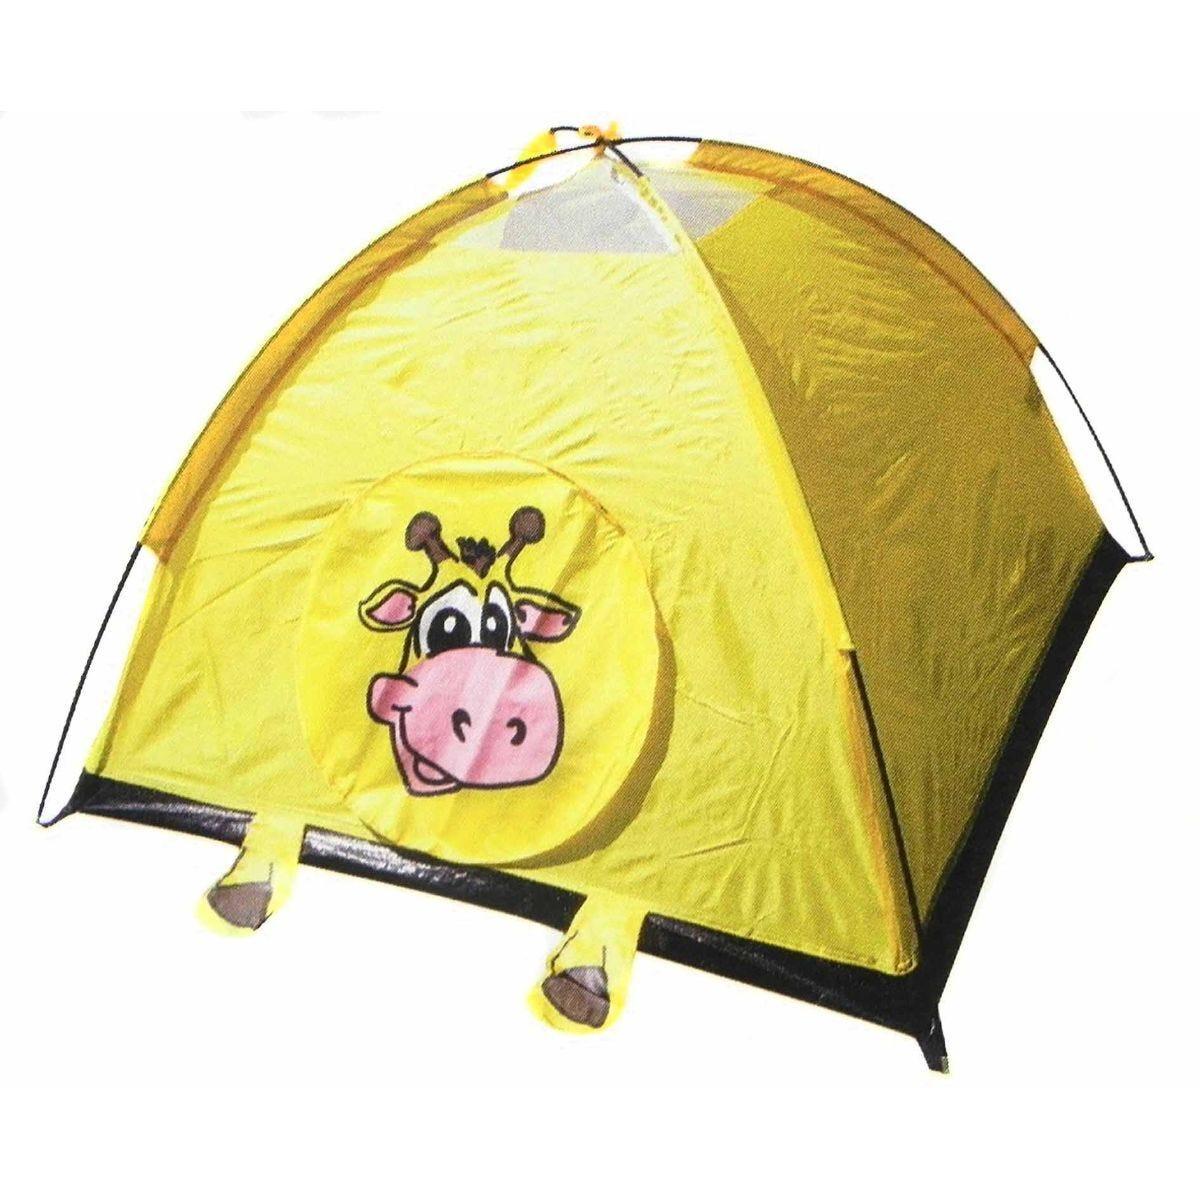 Kids Jungle Animal Camping Play Tent Giraffe